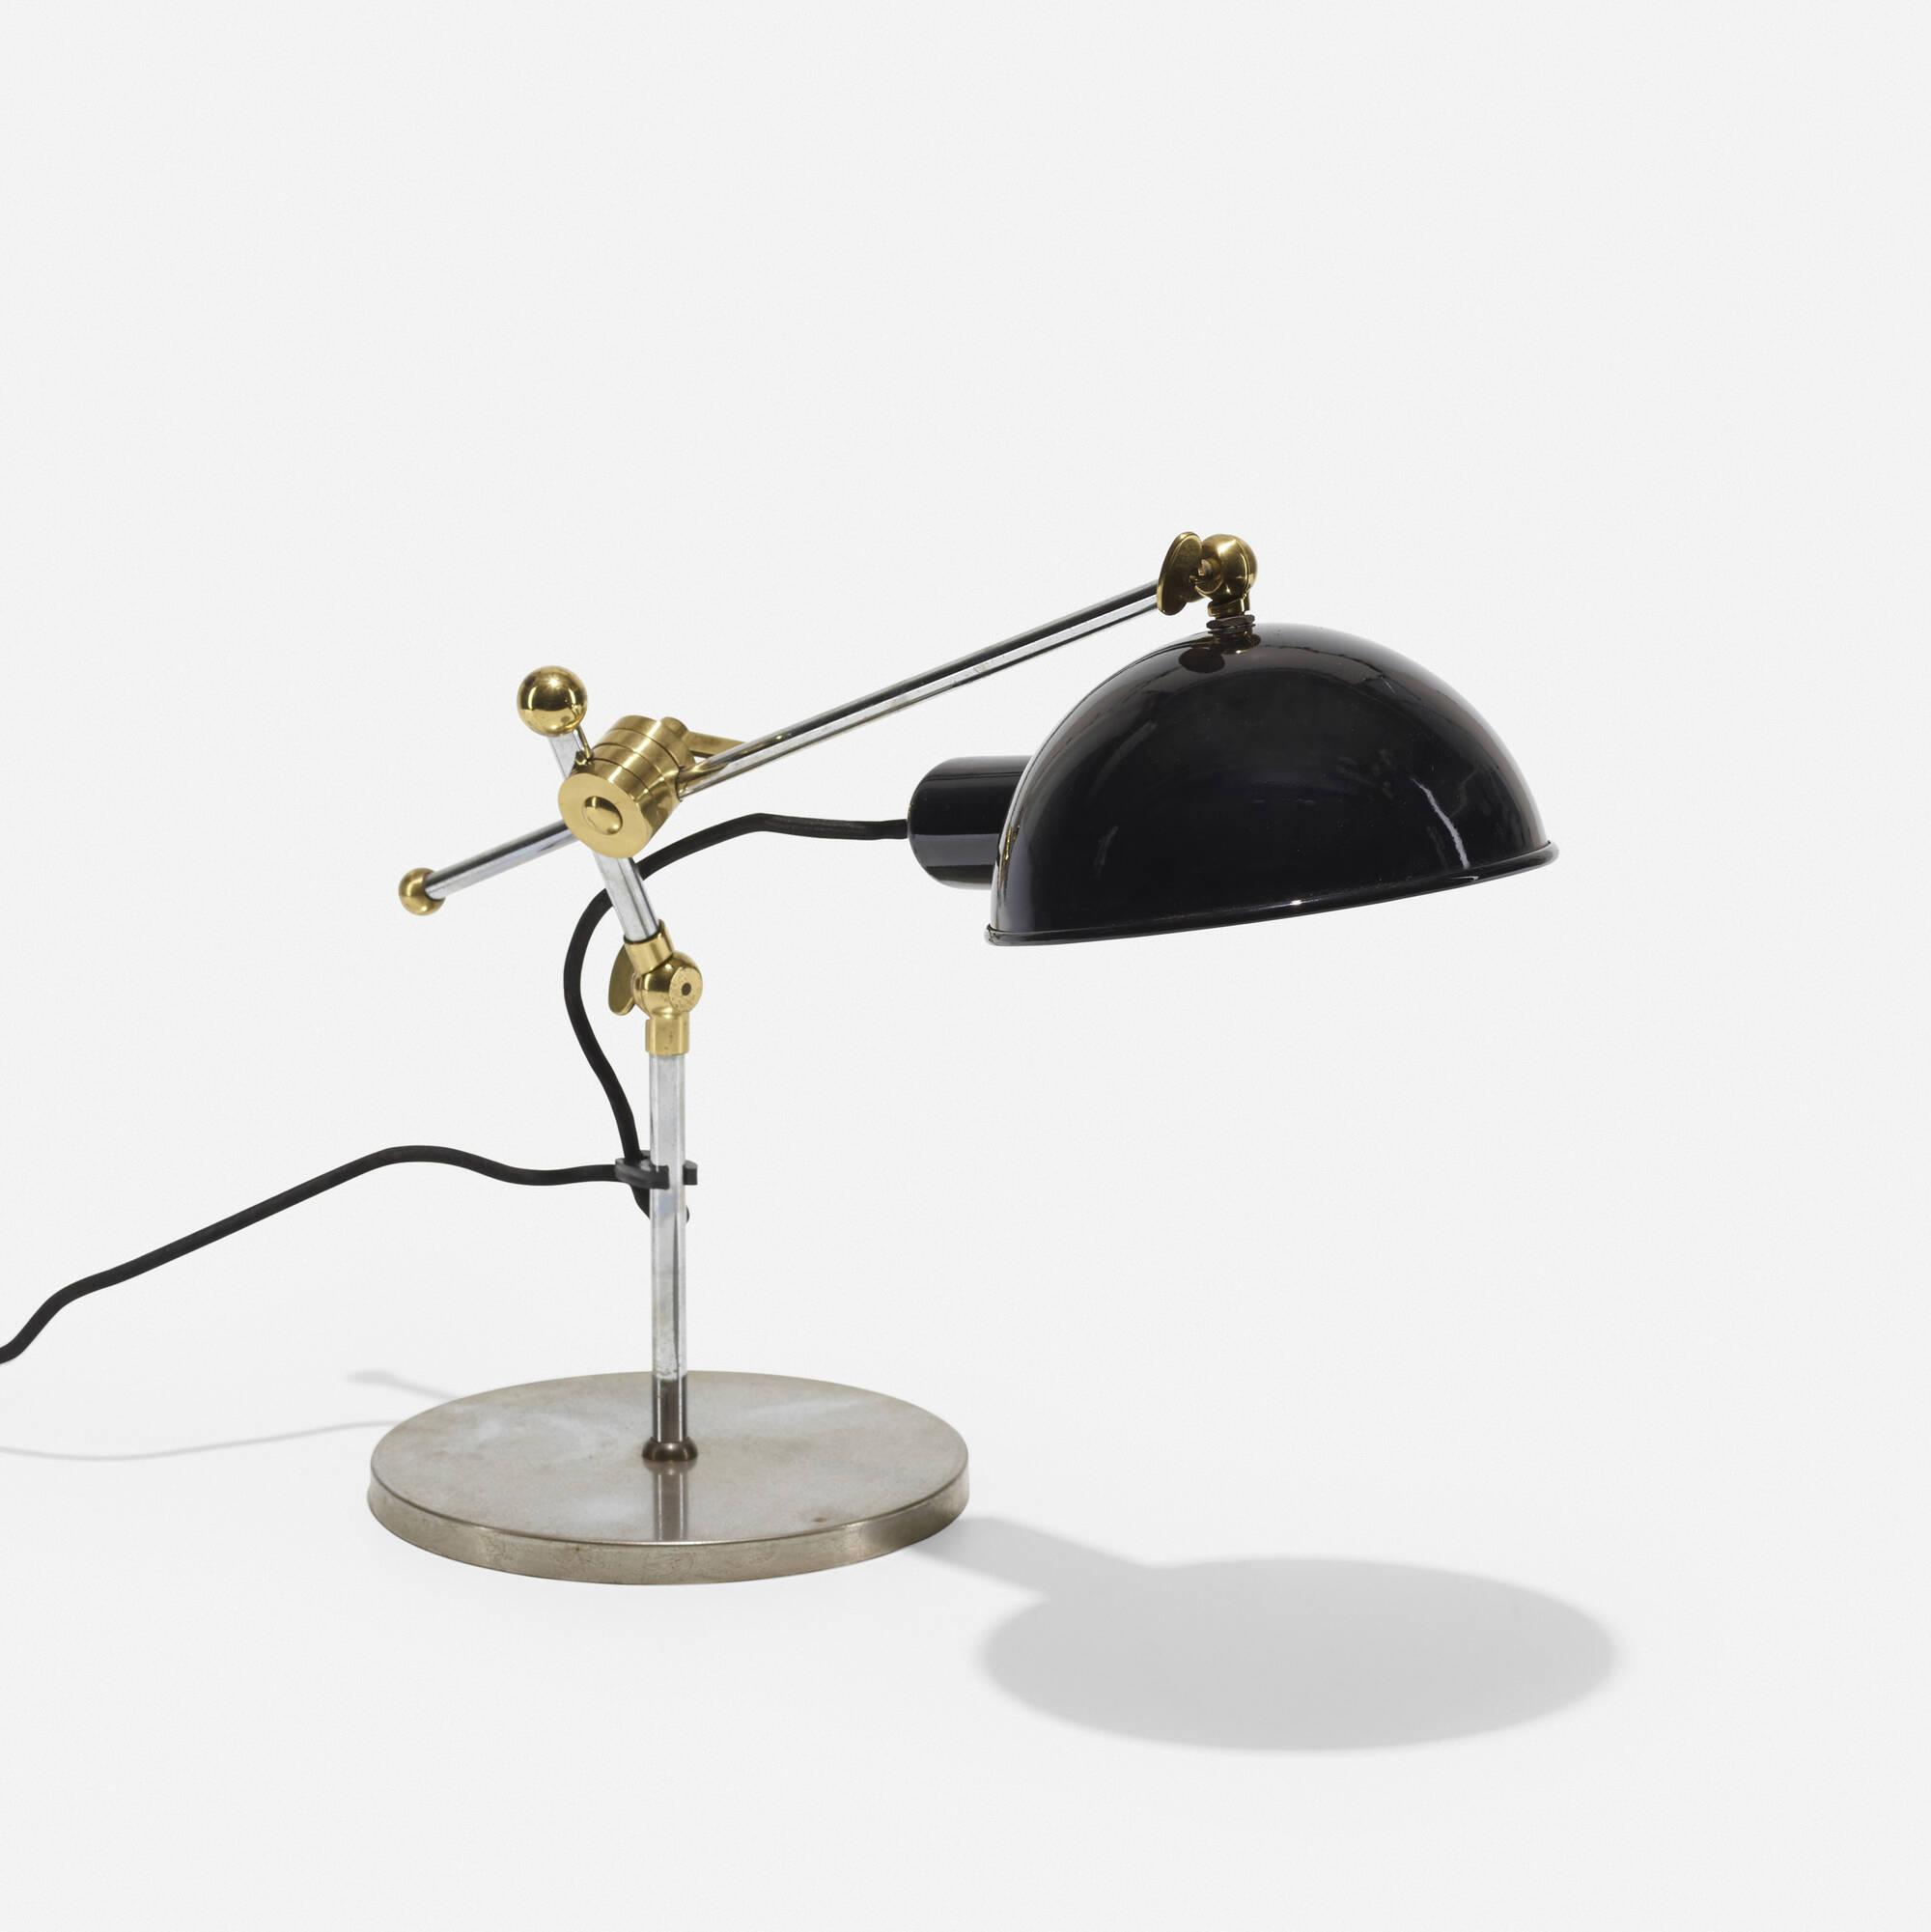 359: Walter Schnepel / adjustable desk lamp, model SF 27 (2 of 3)